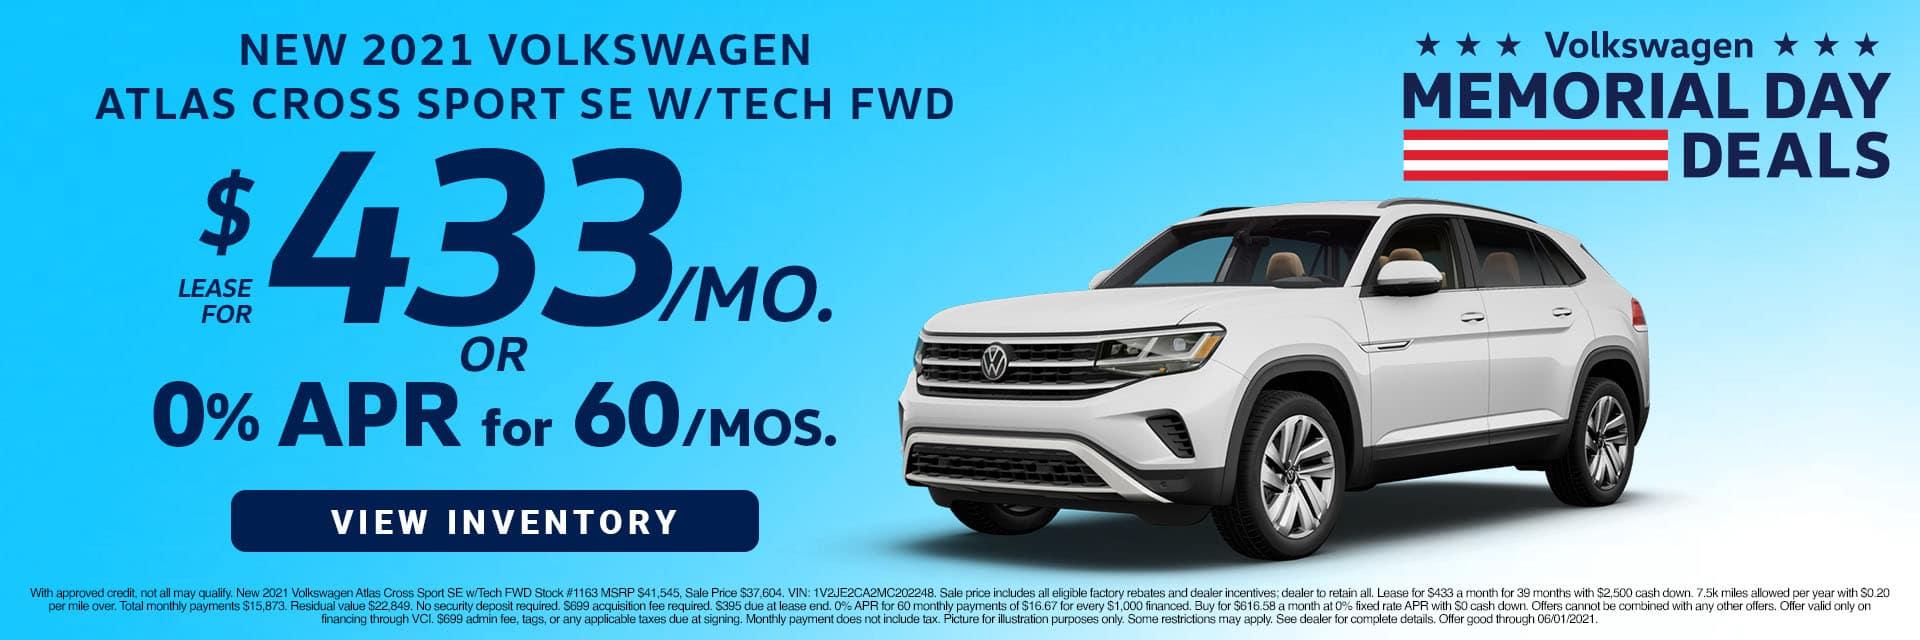 CVWG-May 20212020 Volkwagen Atlas Cross Sport